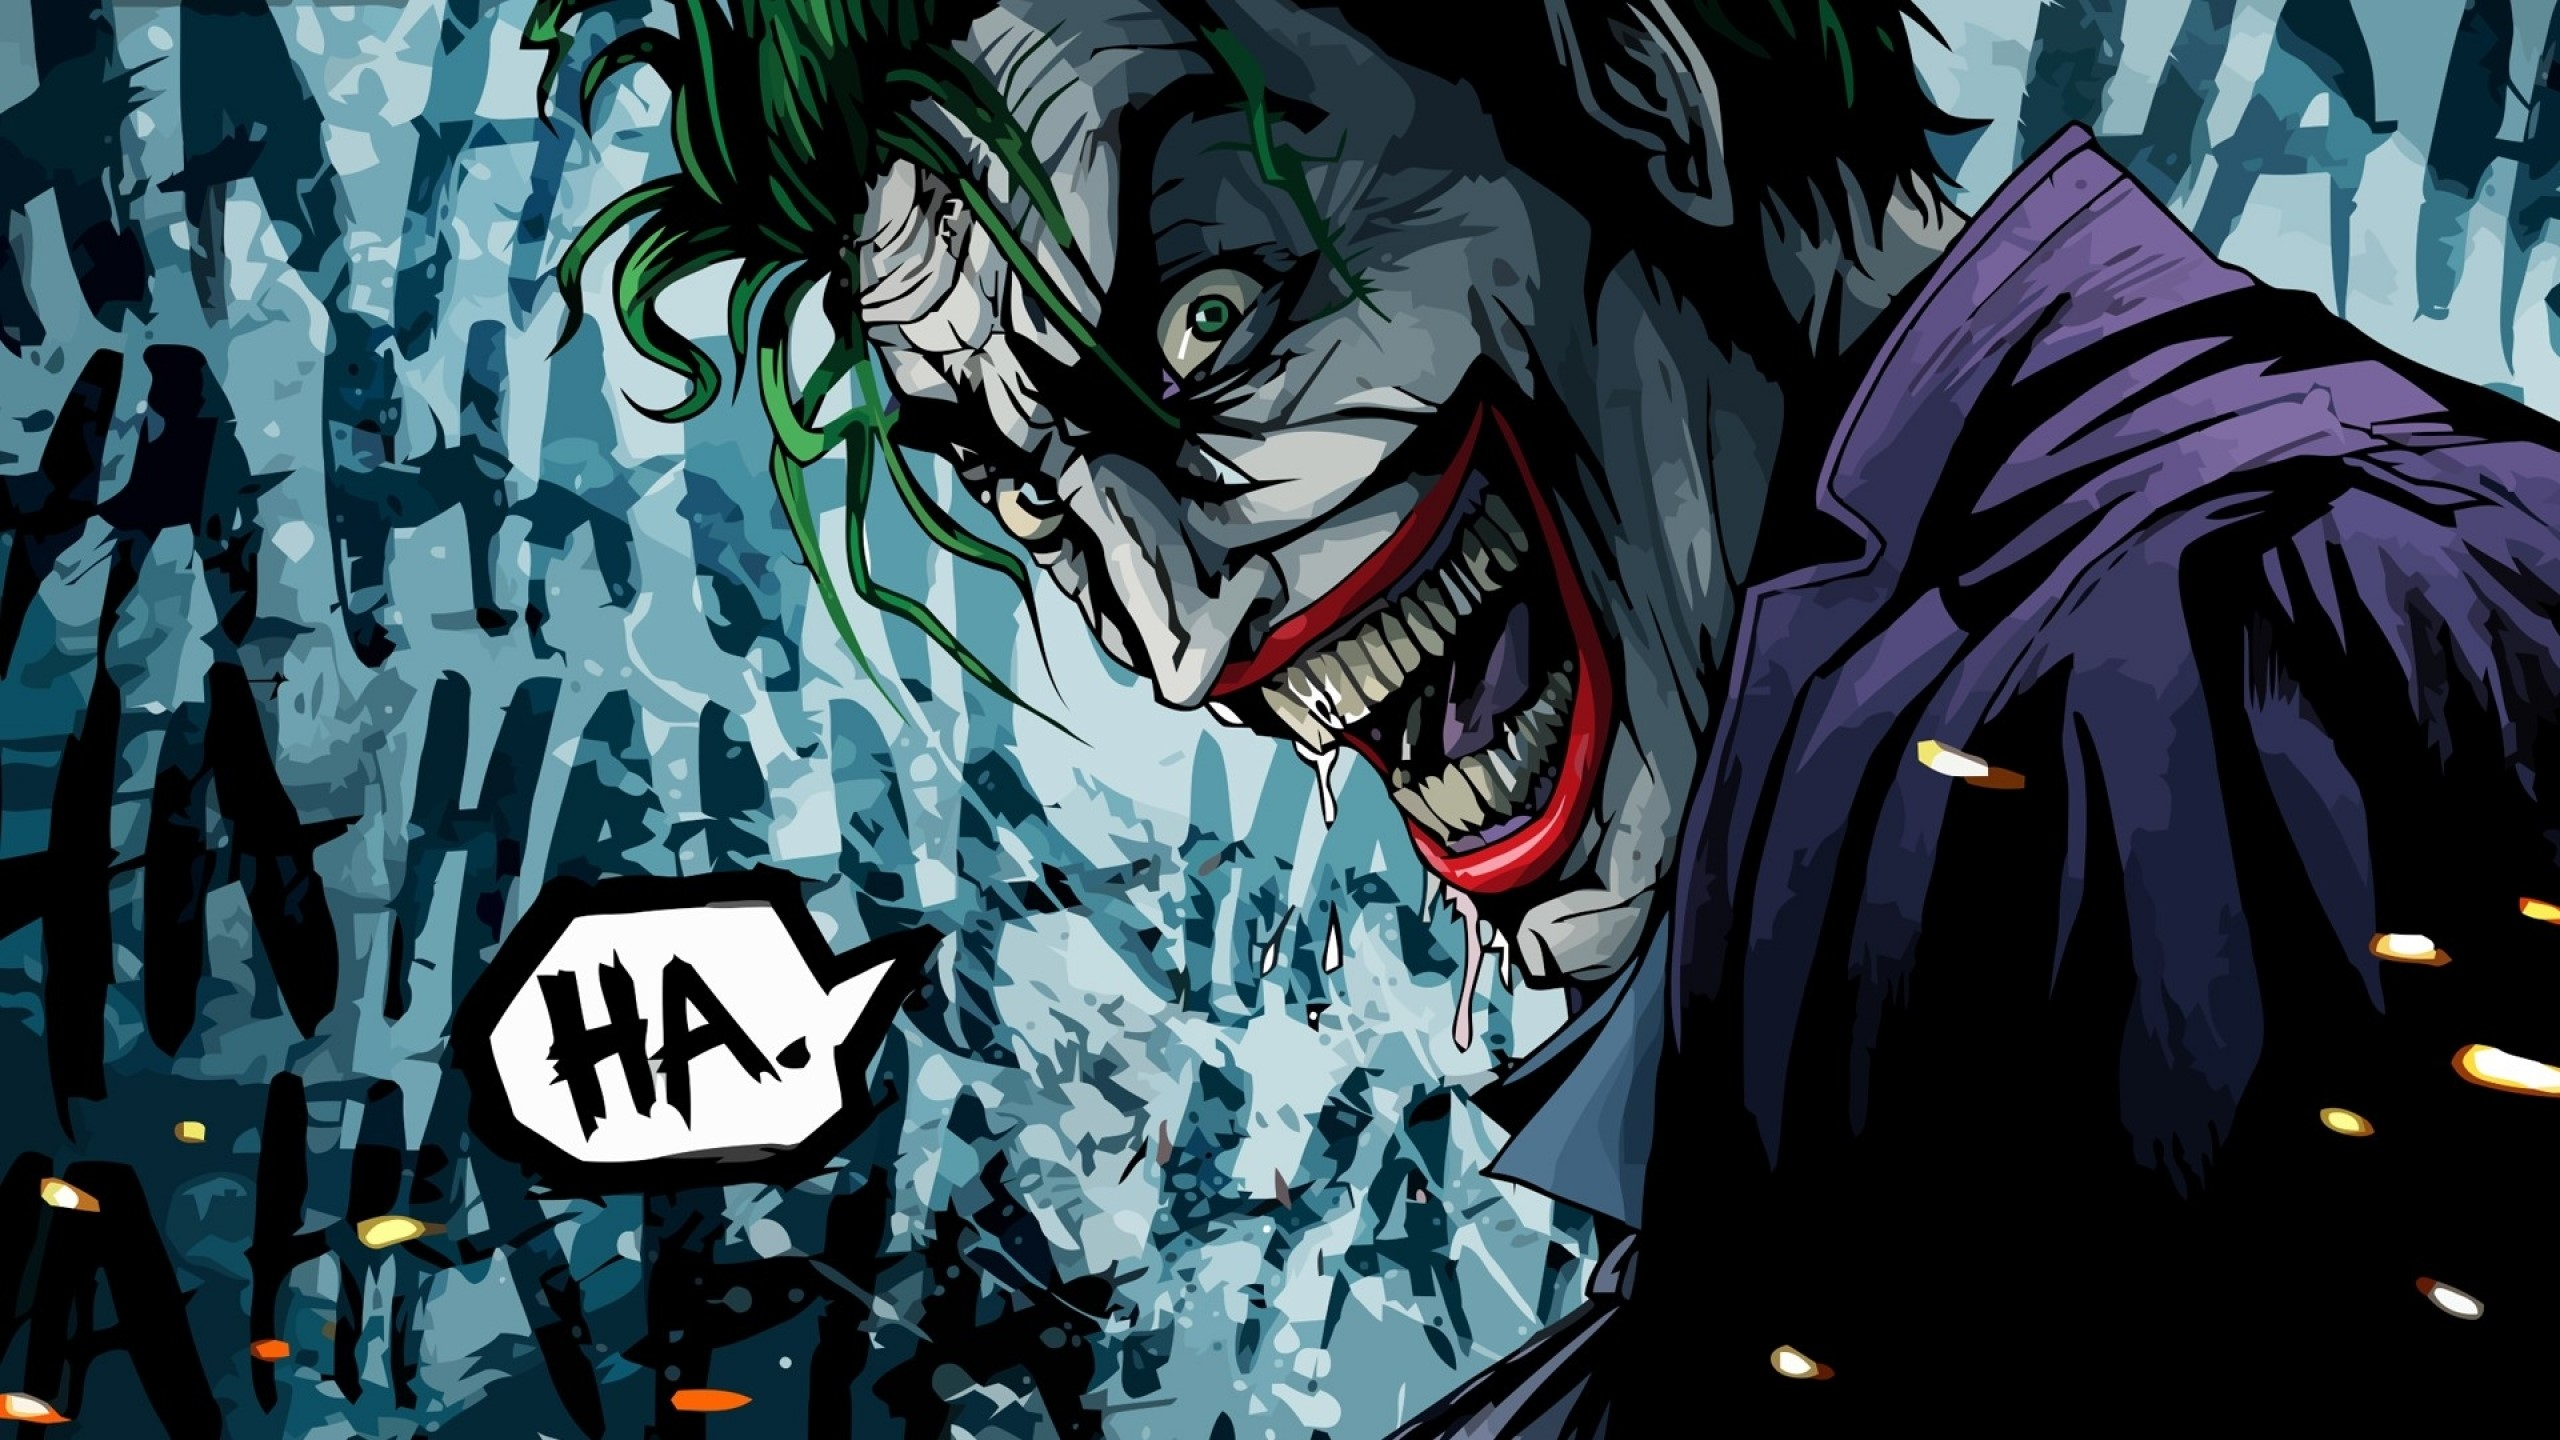 Fondo de pantalla de Joker - Guason Comic Imágenes